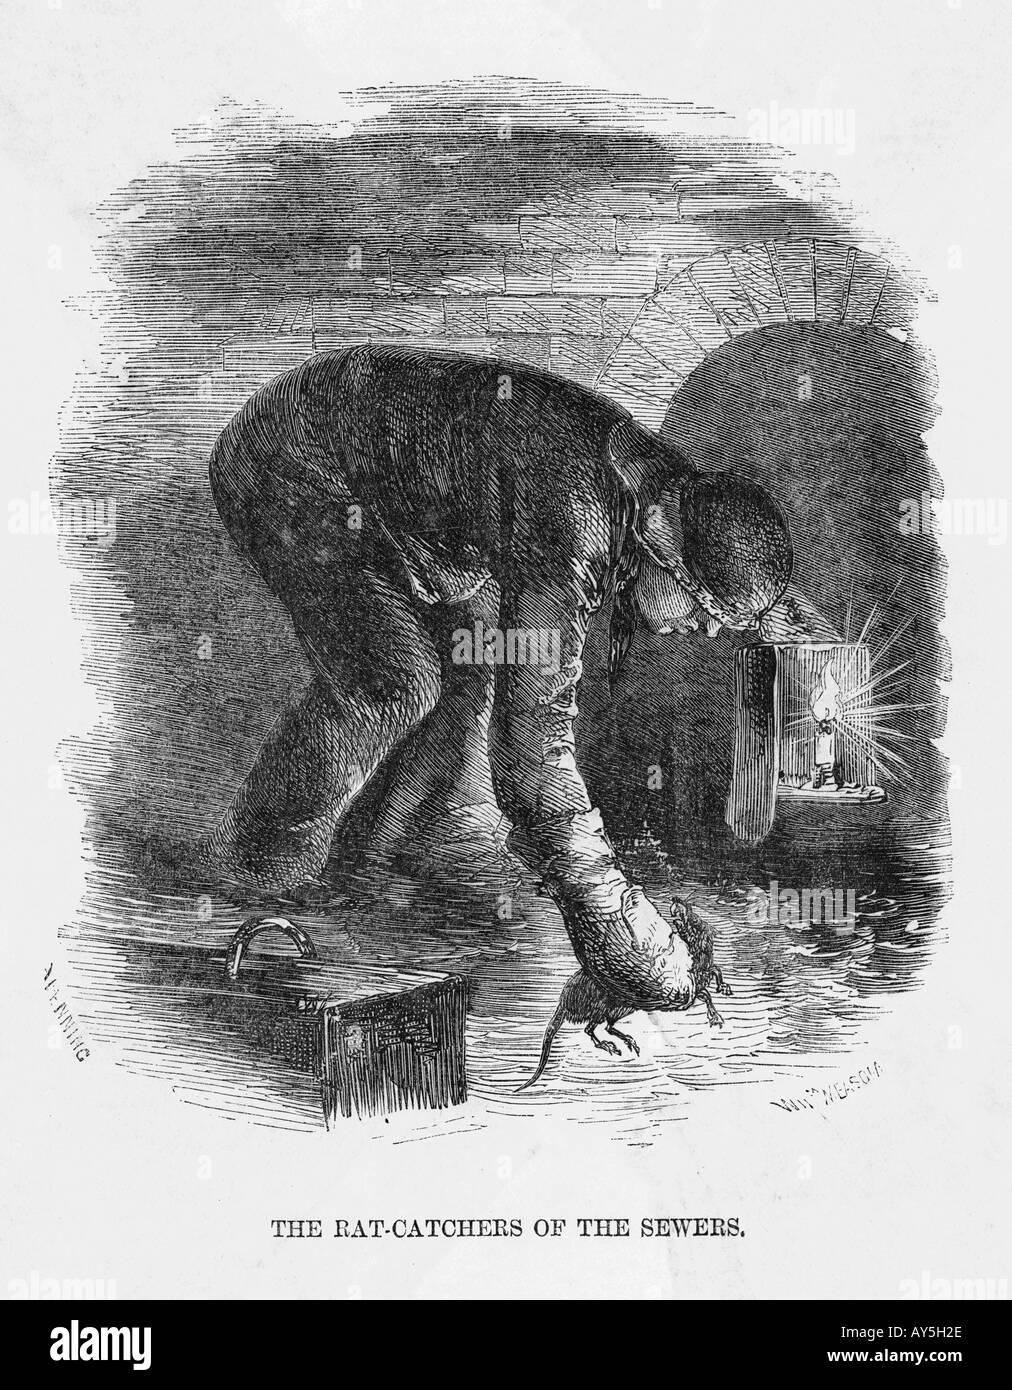 London Rat Catcher - Stock Image